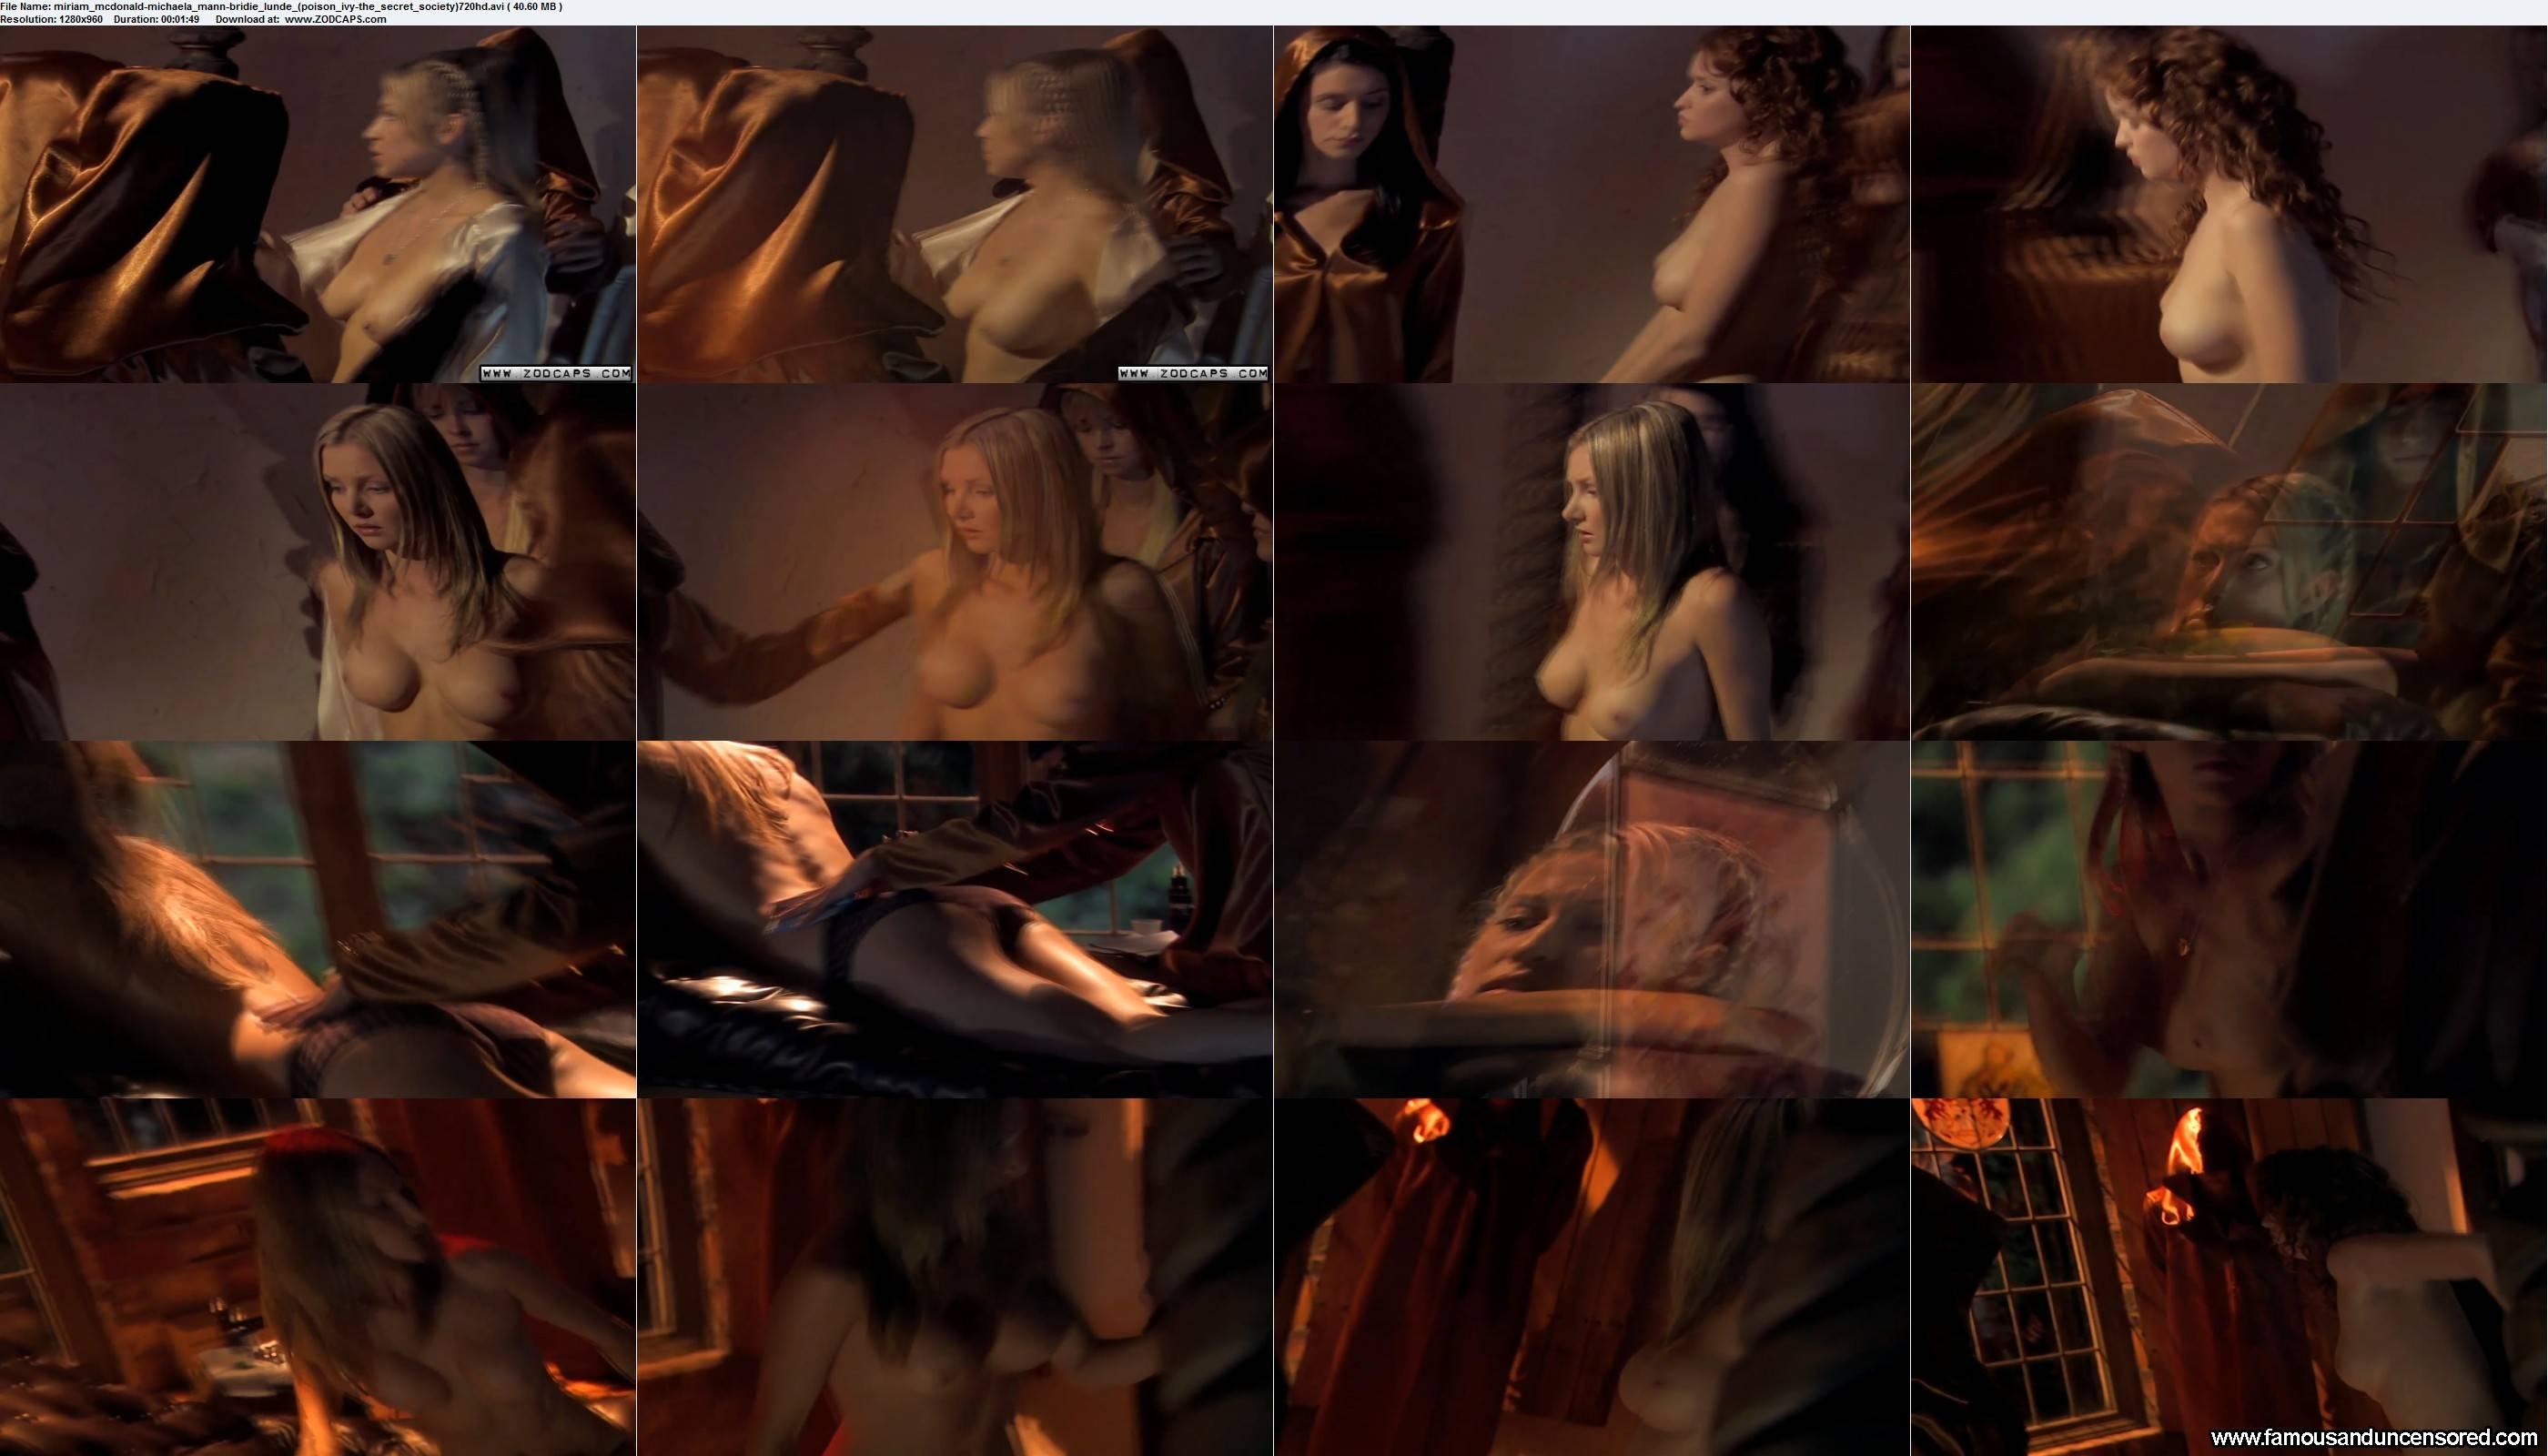 miriam-mcdonald-sex-scene-farm-girls-models-nude